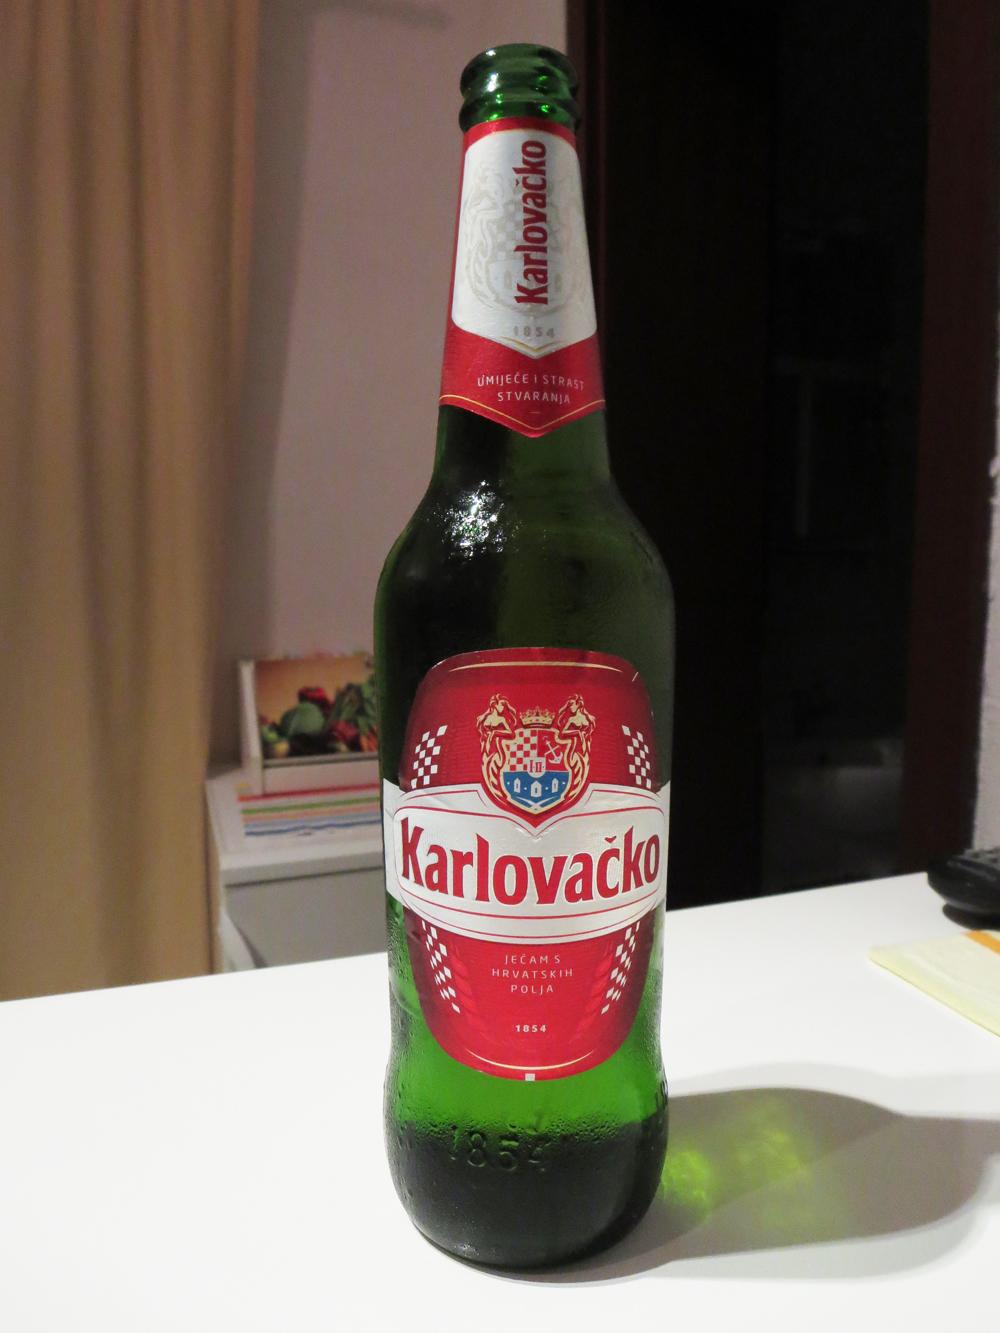 Karlovacko is a popular Croatian beer.